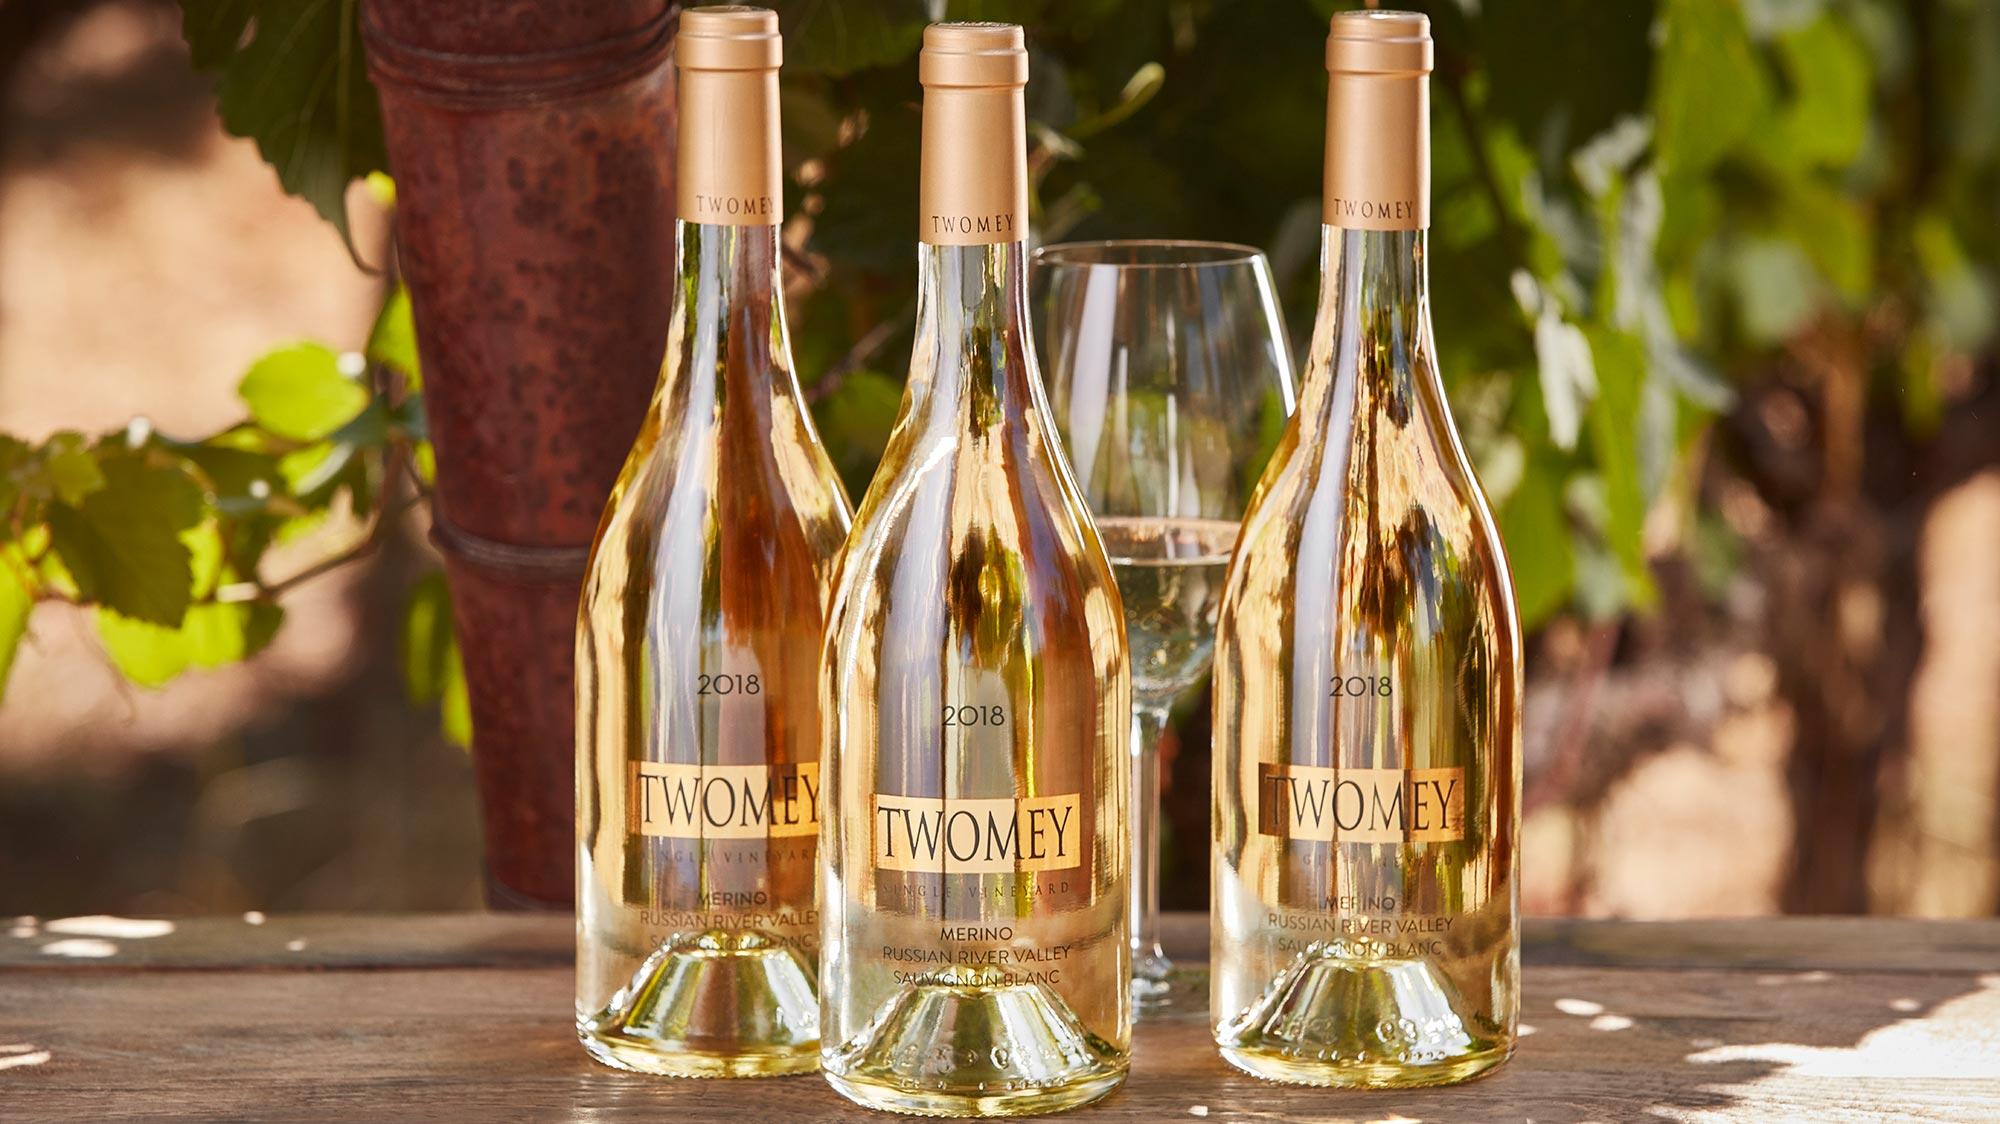 2018 Twomey Merino Sauvignon Blanc